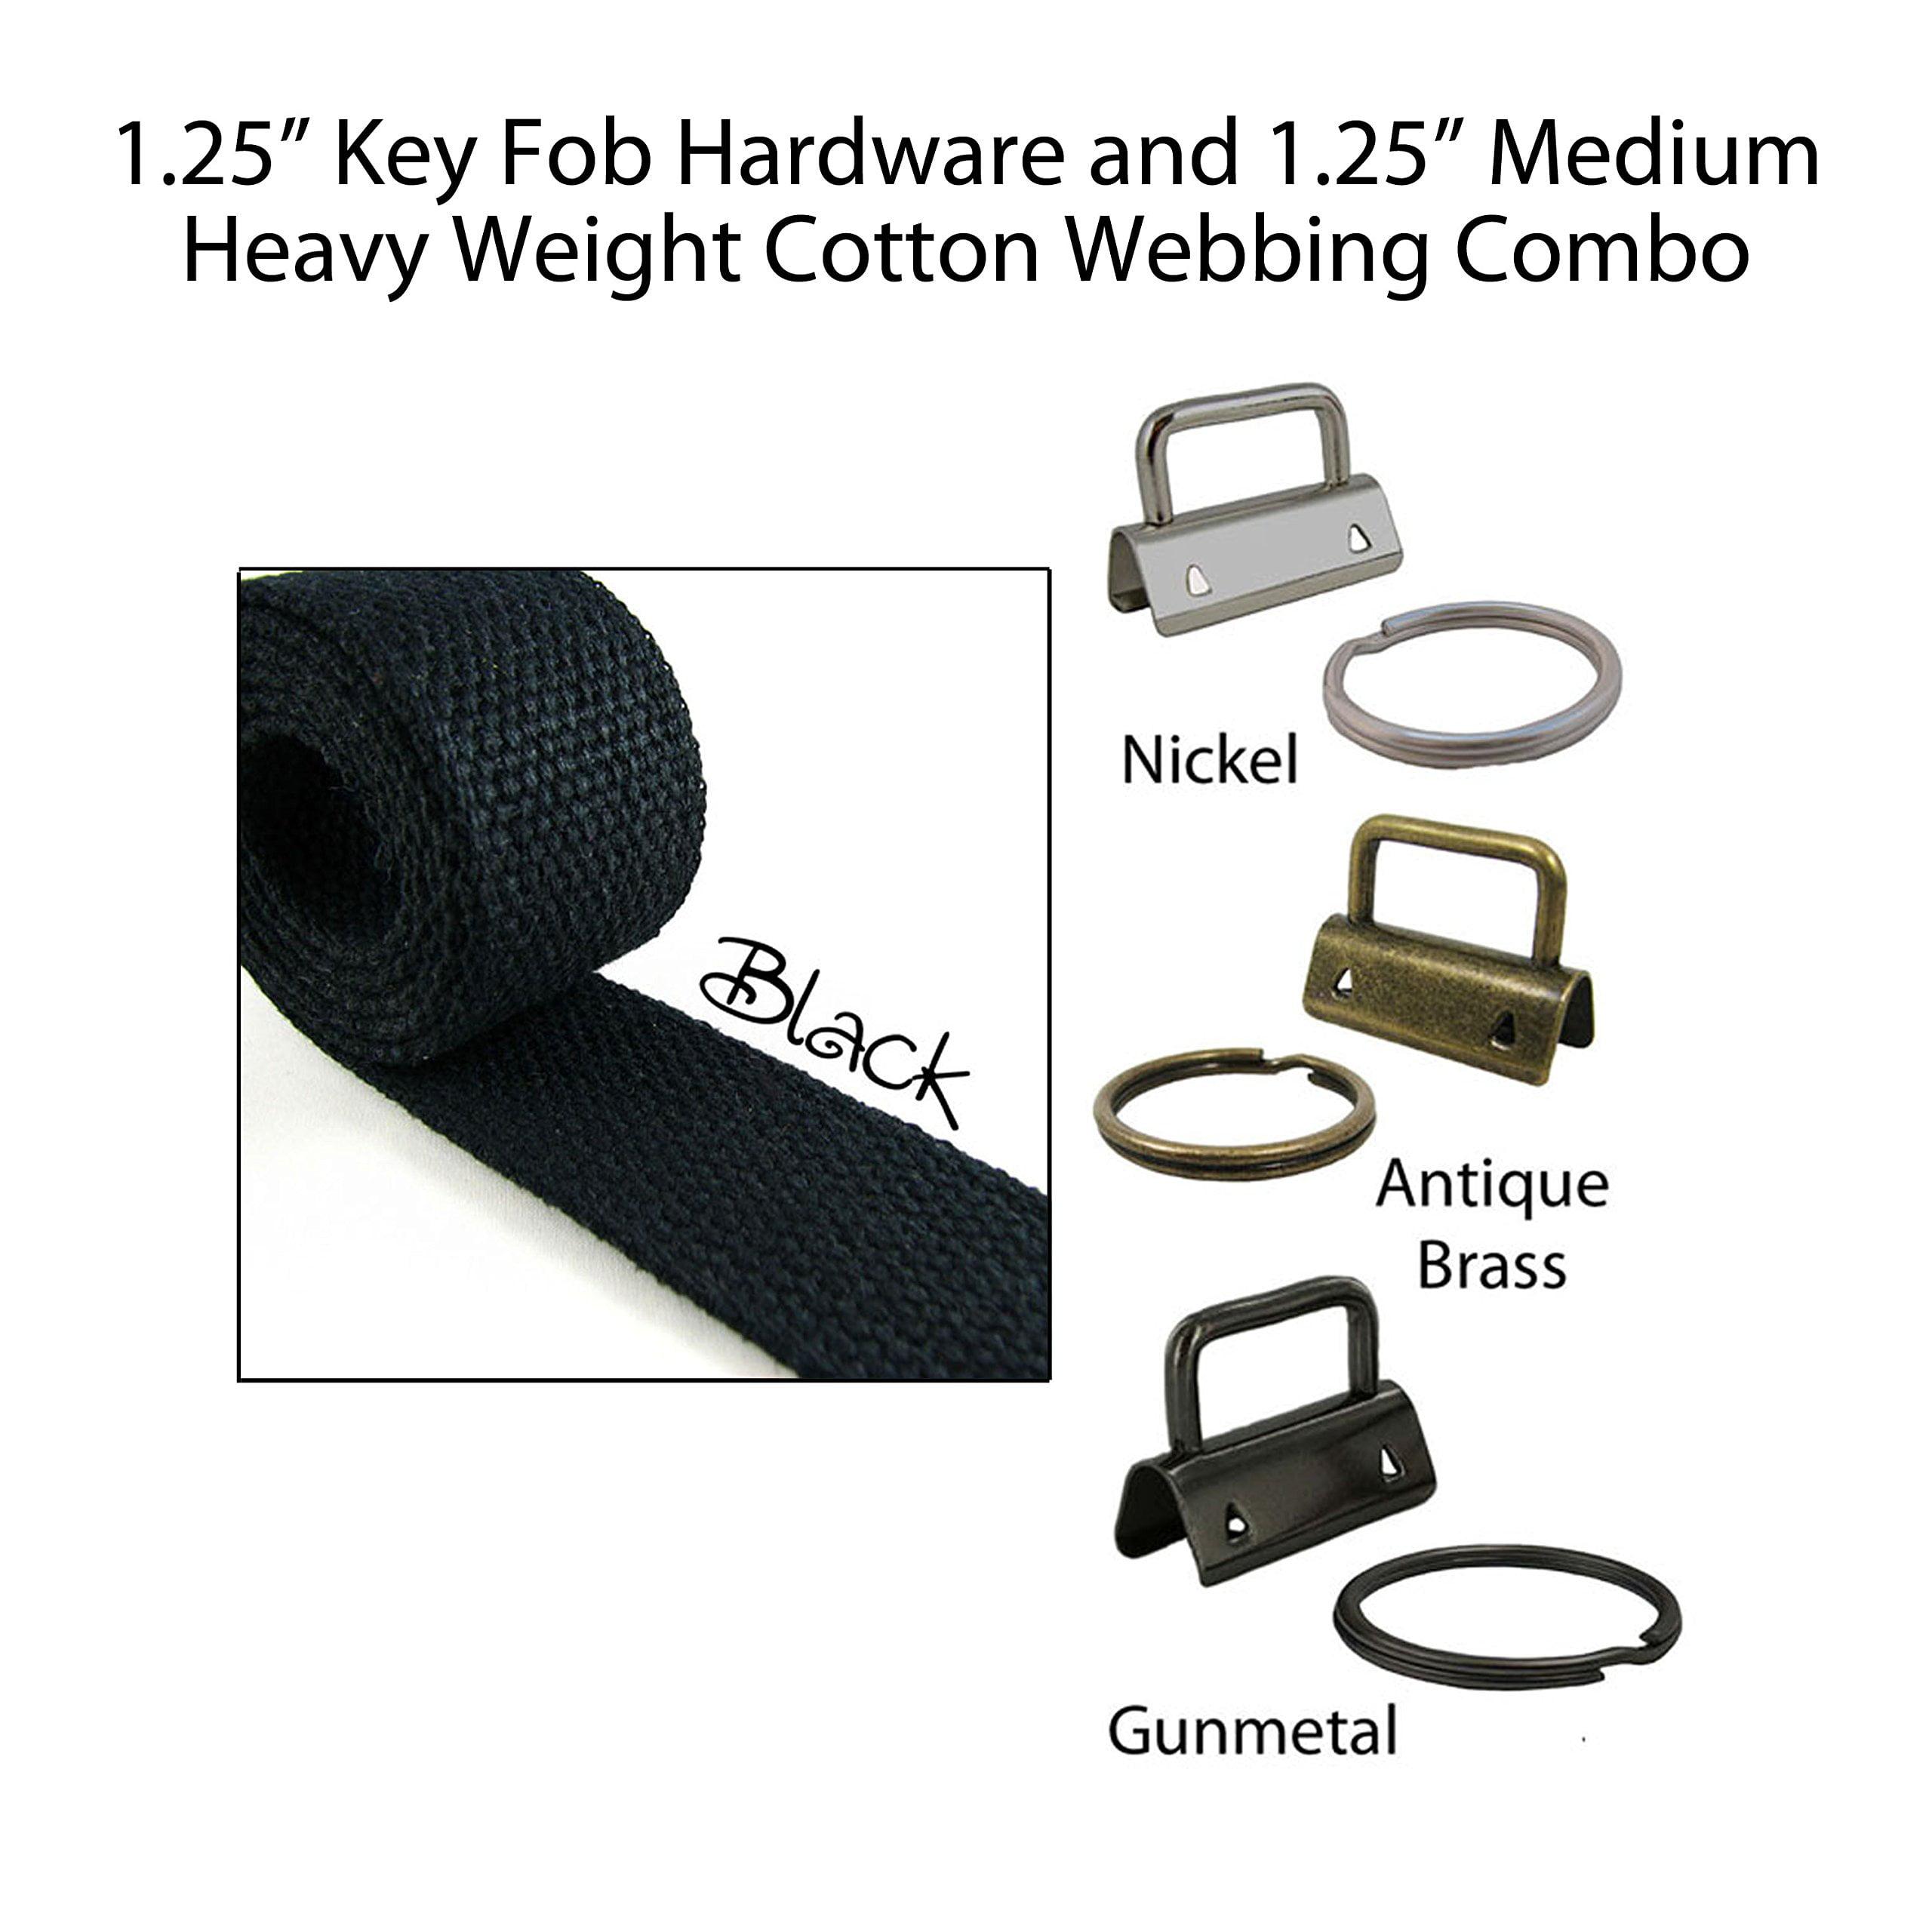 "1.25"" Key Fob Hardware and 1.25"" Cotton Webbing Combo - Black"